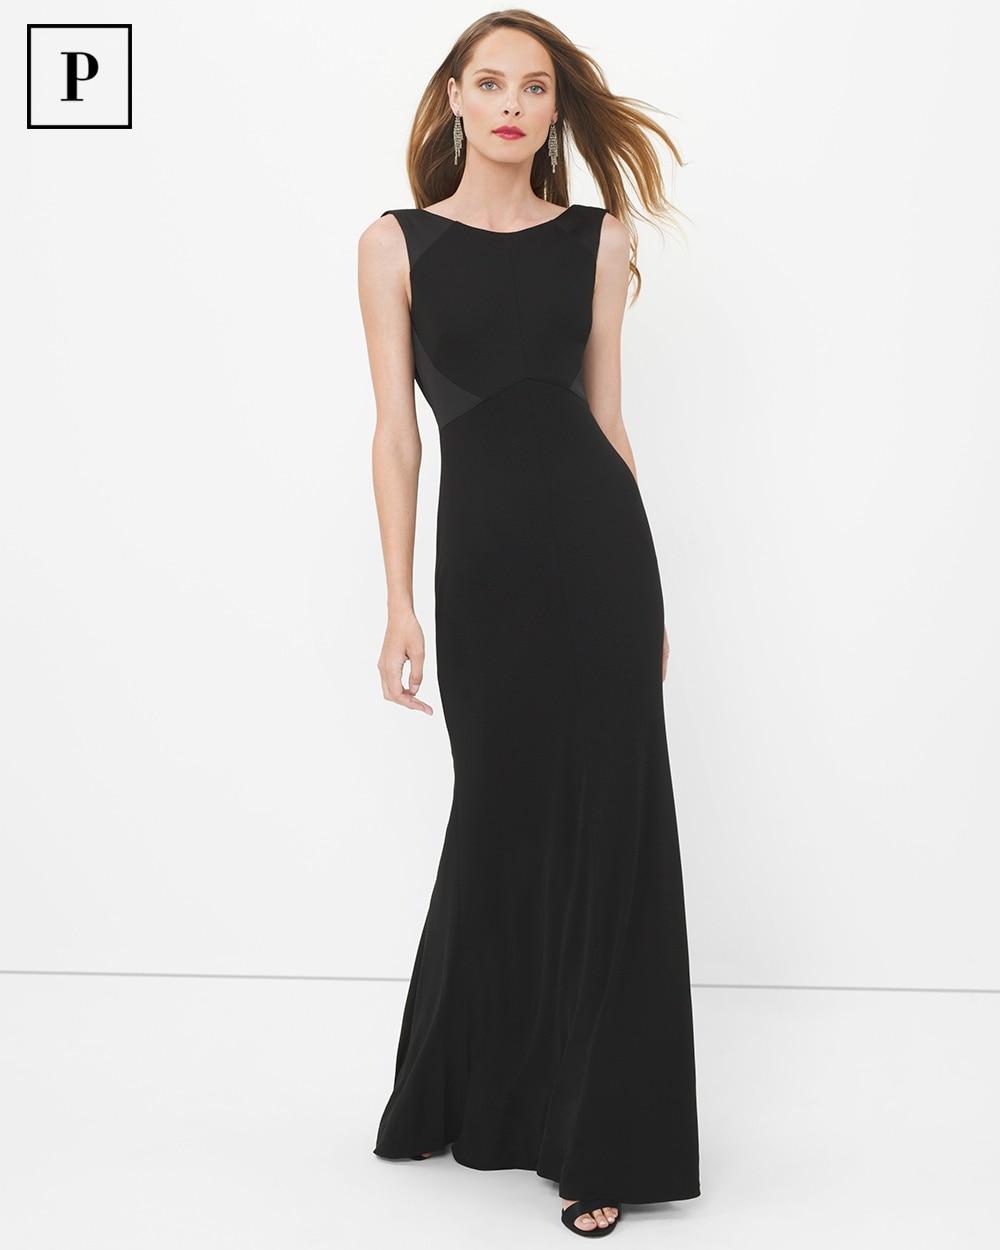 drapes wholesale cut chiffon neckline flimsy dress free pullover black low back shipping mini drape boat buy